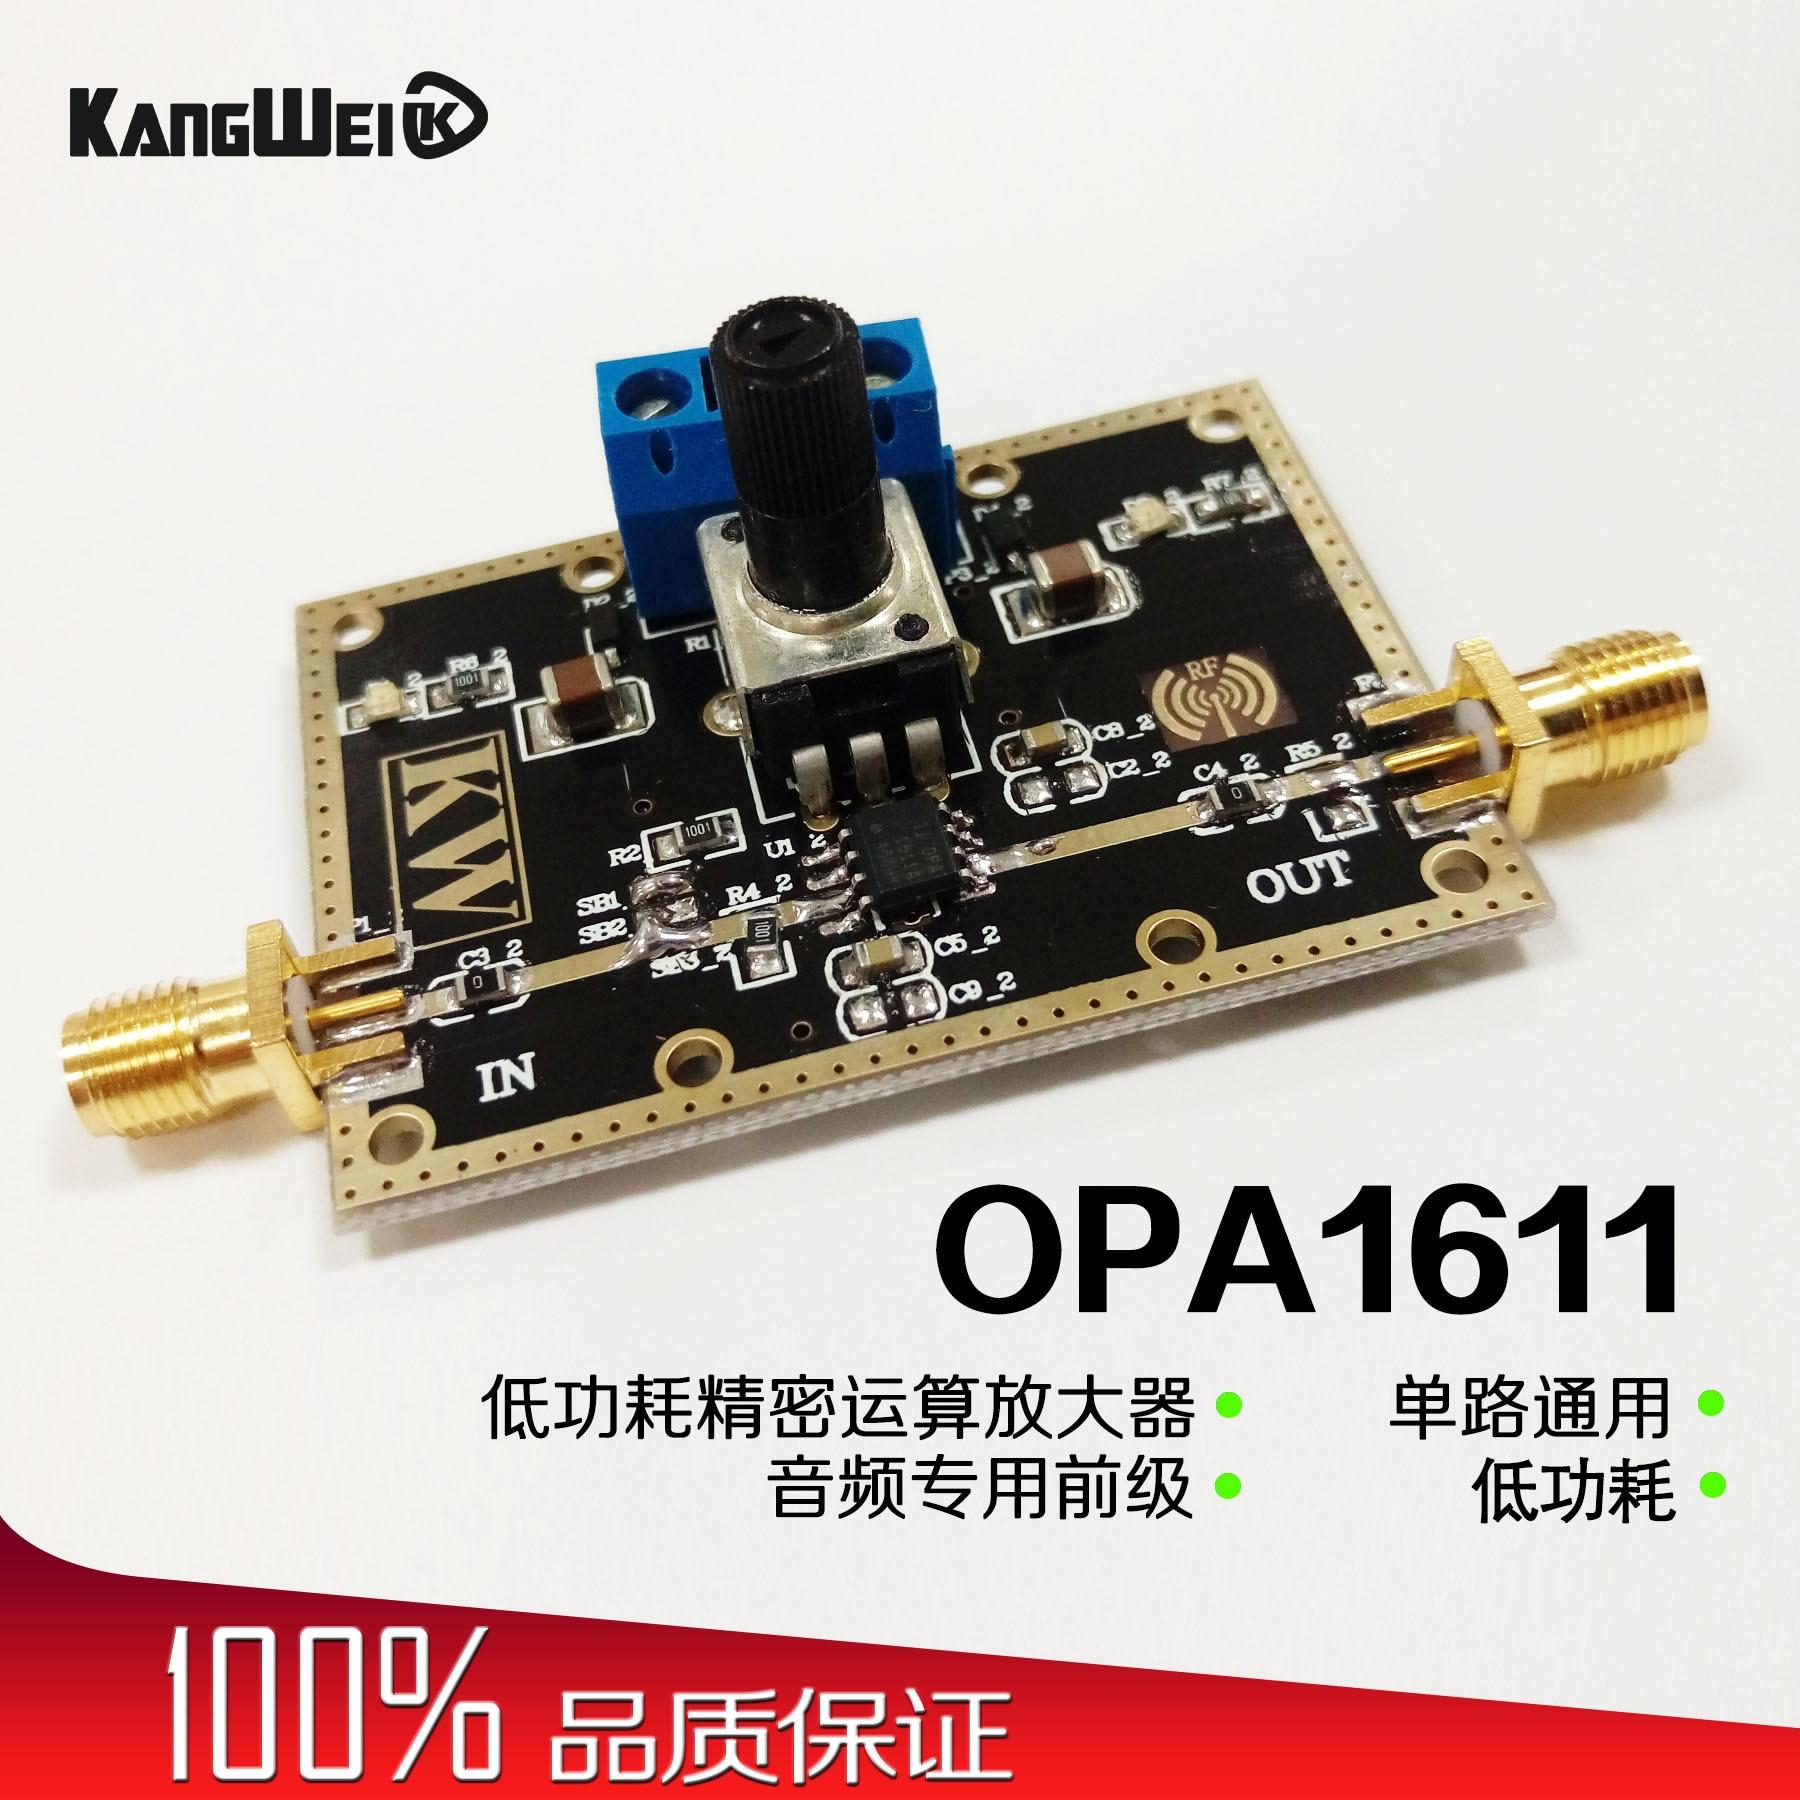 OPA1611 module, low power, precision operational amplifier, audio amplifier, preamplifier, operational amplifier купить чай femrich opa украина